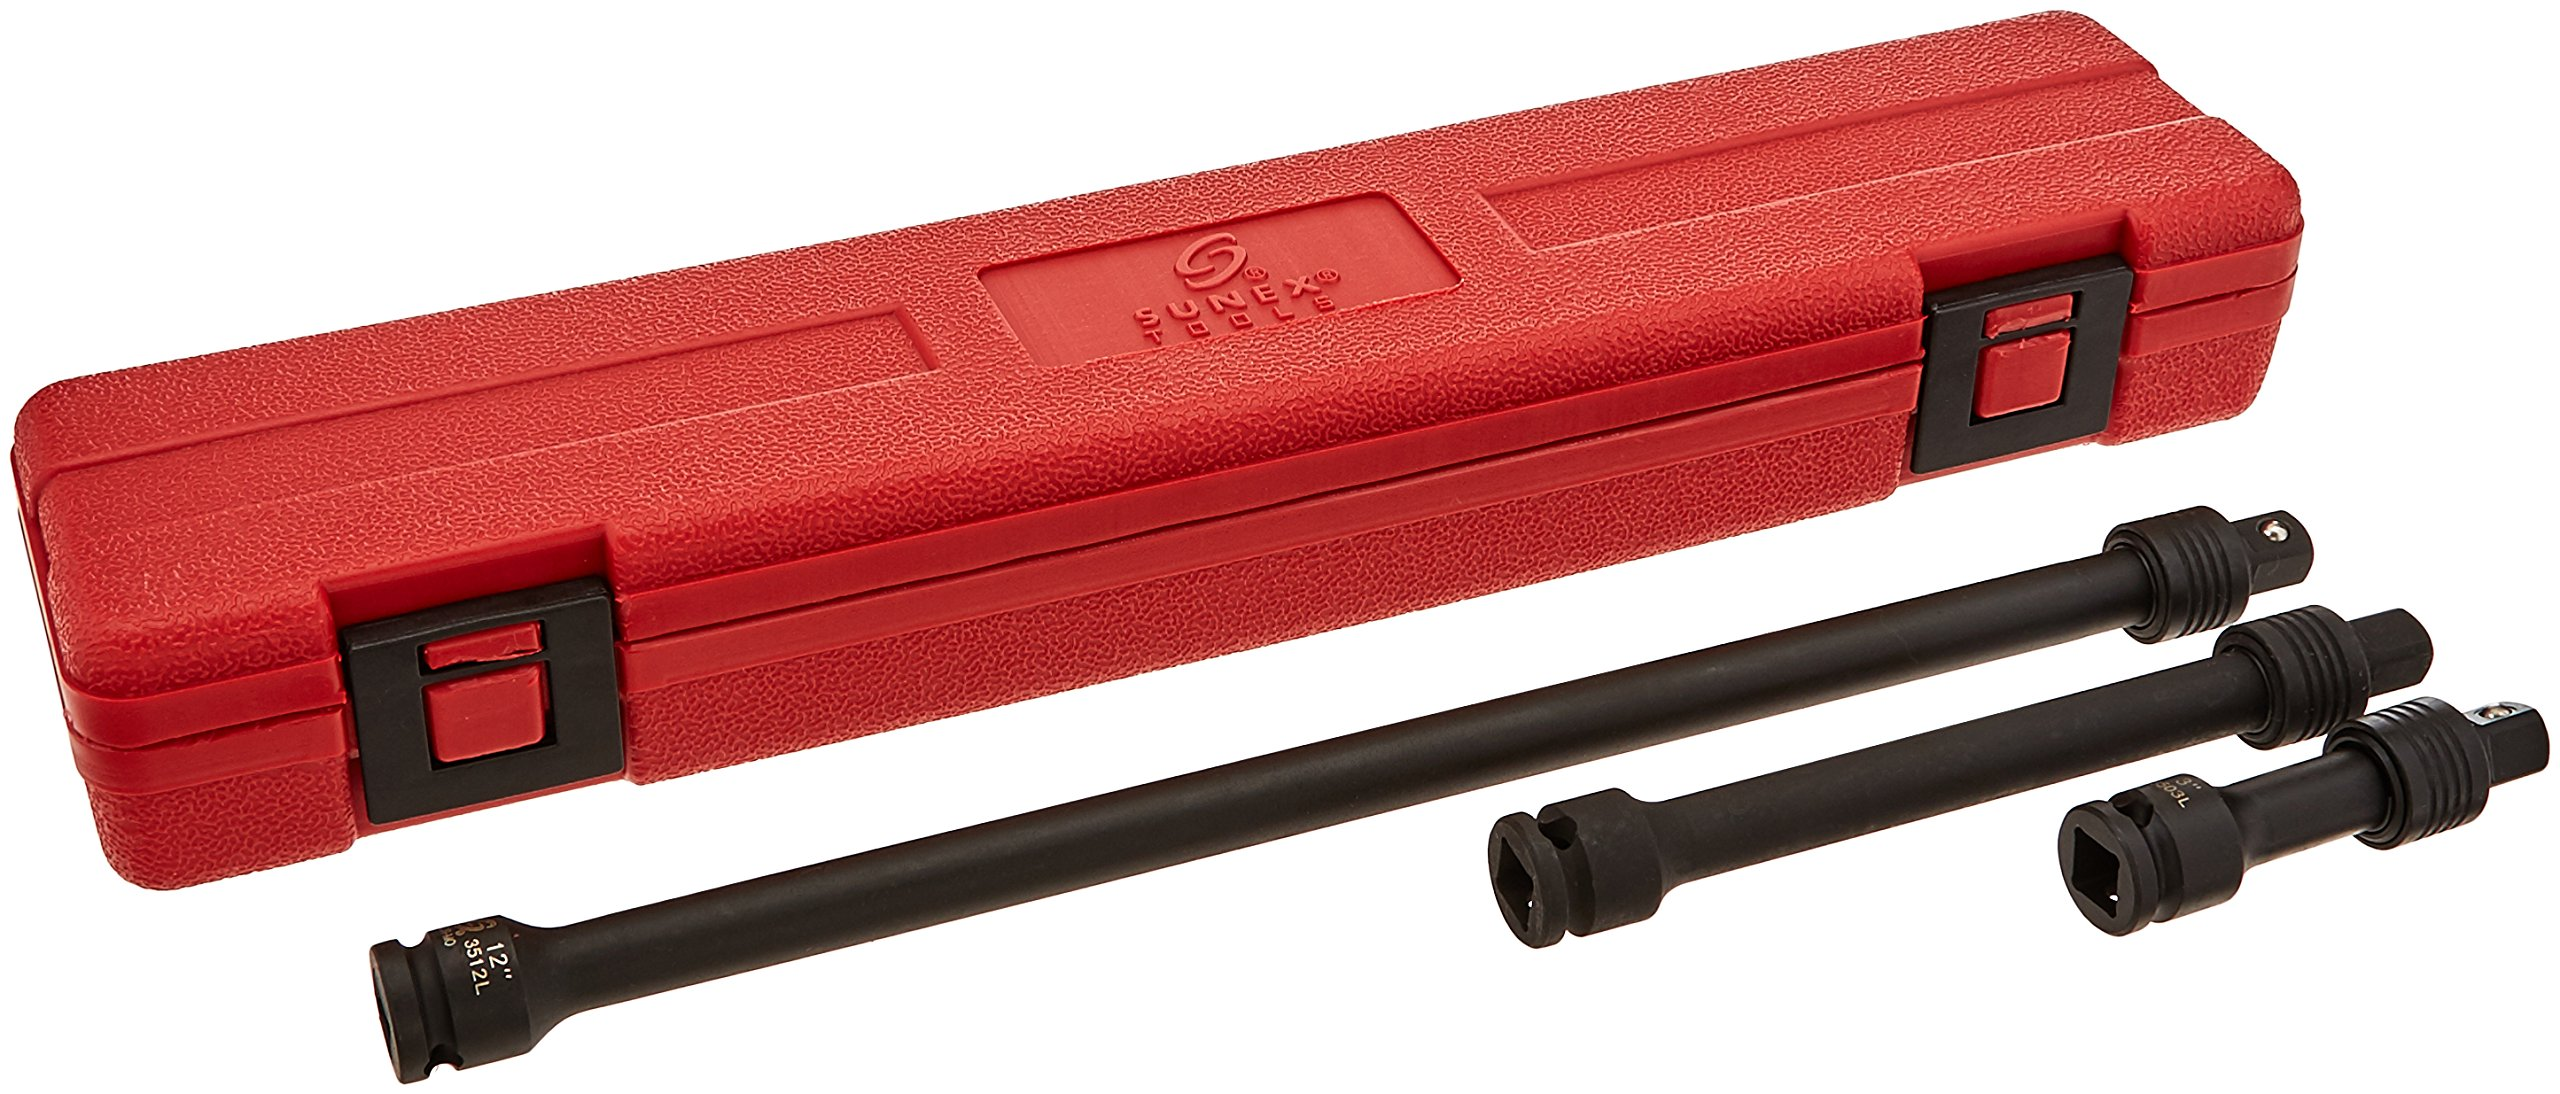 Sunex 3501 3/8-Inch Drive Locking Impact Extension Set, 3-Piece by Sunex Tools